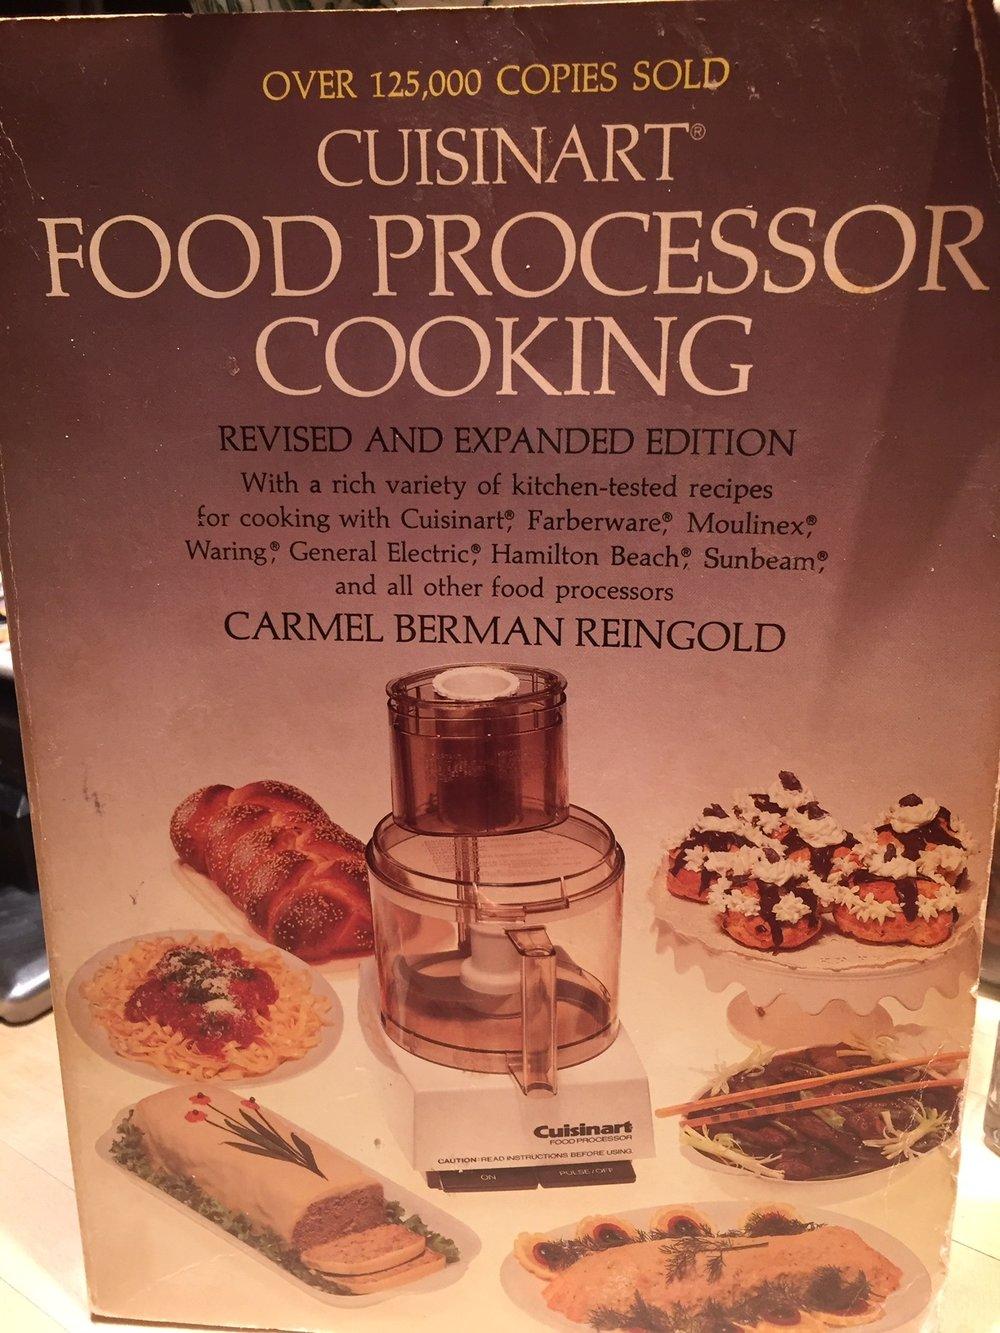 Cami's well used Cuisinart Food Processor Cookbook,